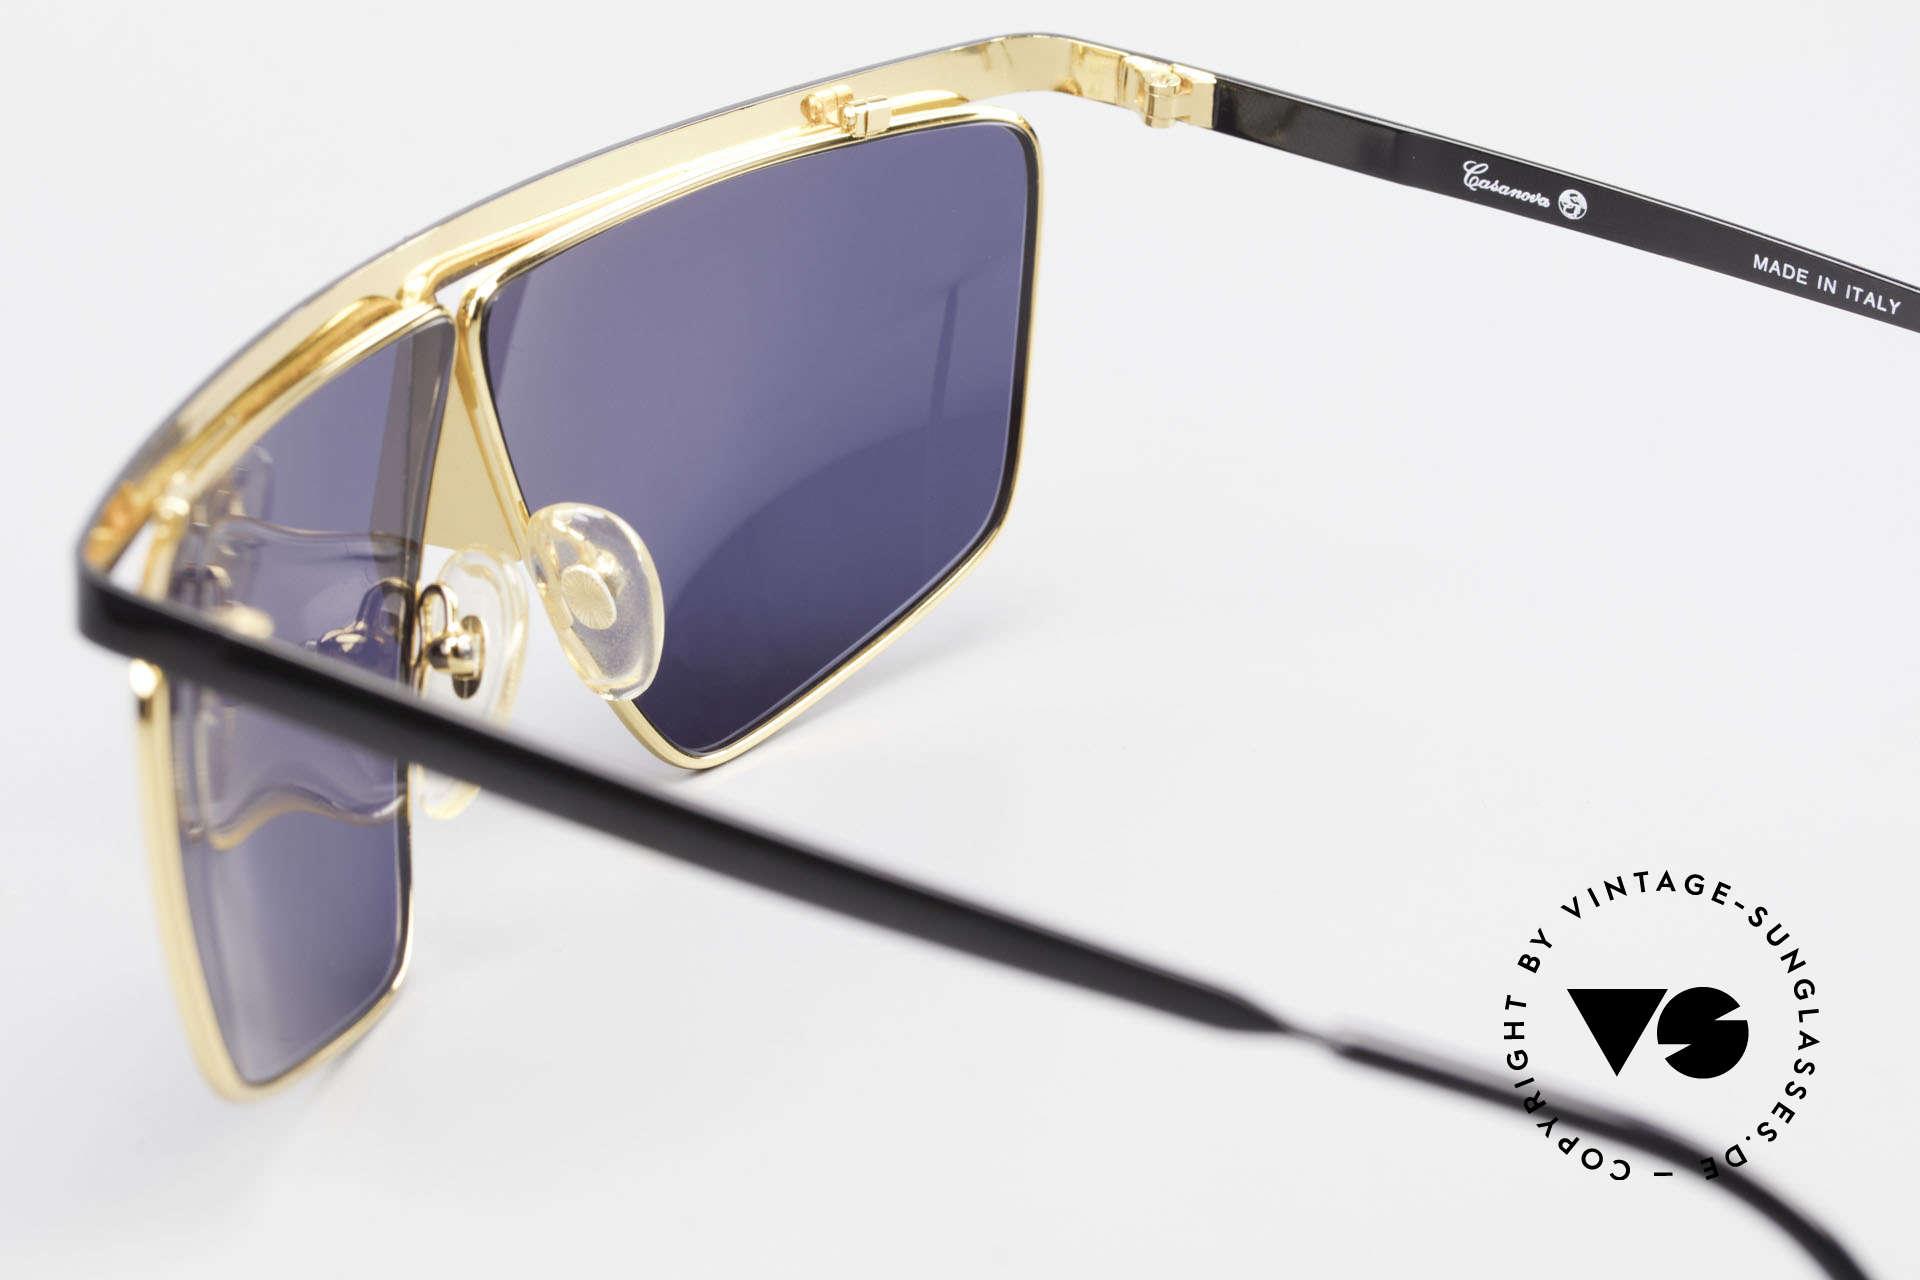 Casanova FC10 24kt Noseguard Sunglasses, NOS - unworn (like all our artistic vintage eyeglasses), Made for Men and Women